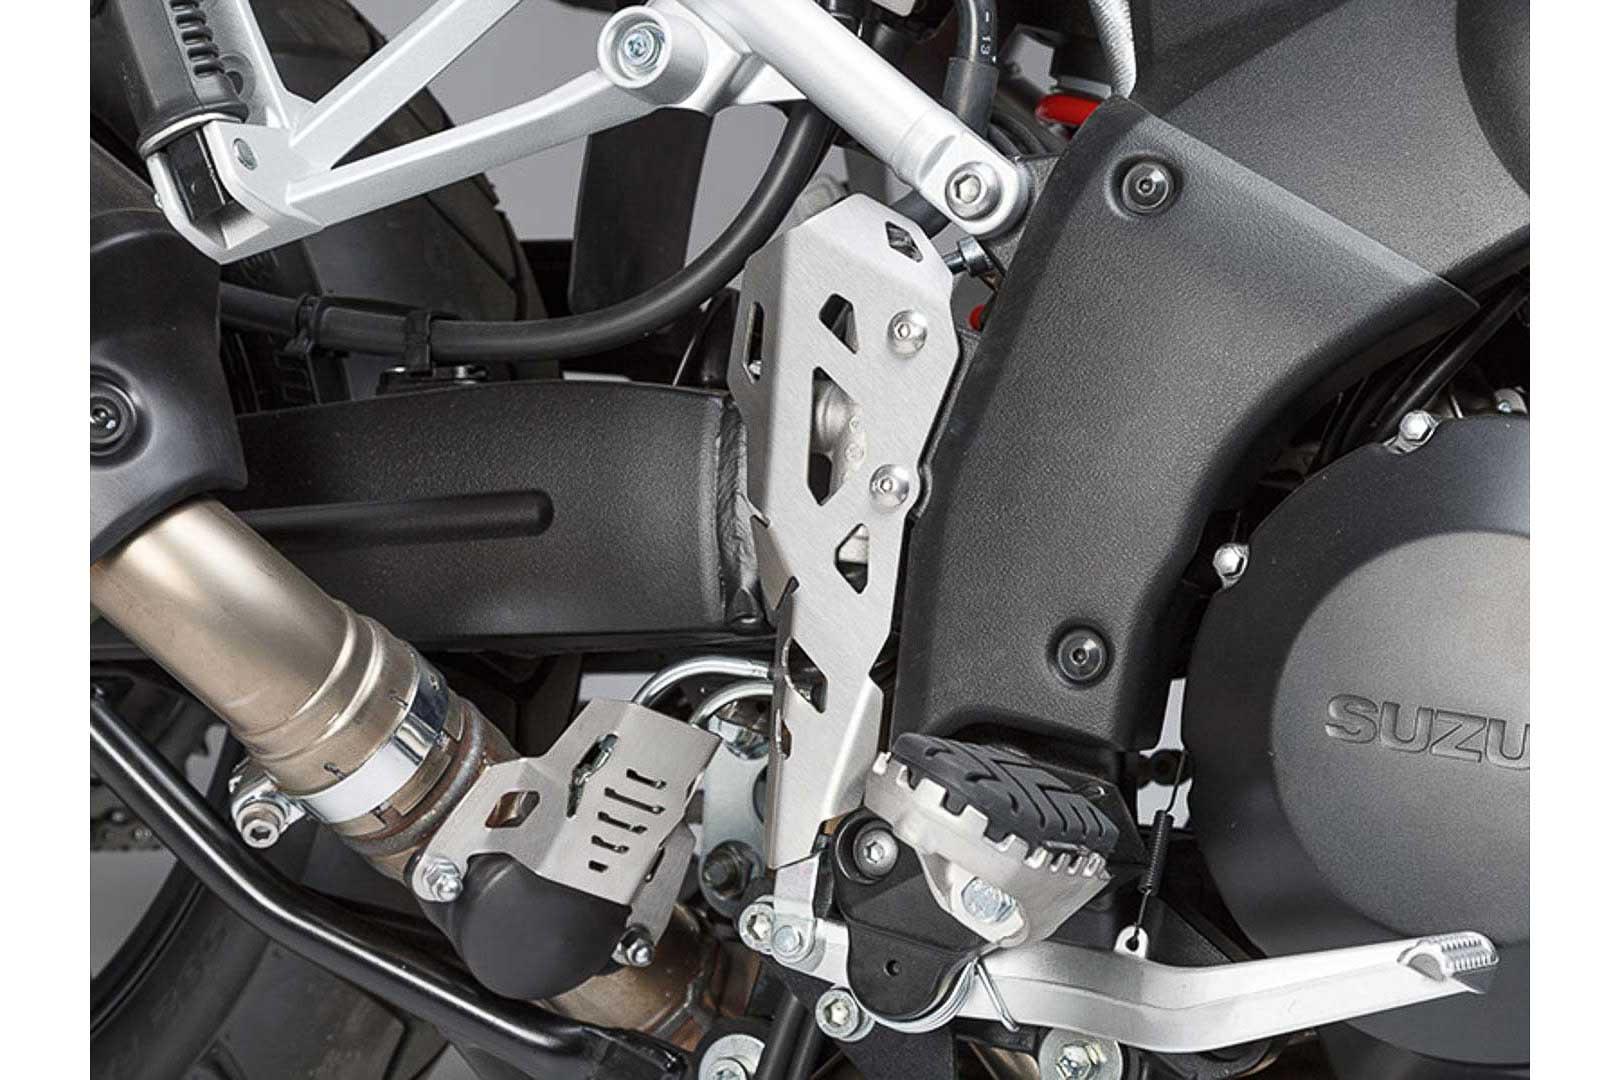 Takajarrusylinterin suoja, Suzuki DL1000 V-Strom 14-